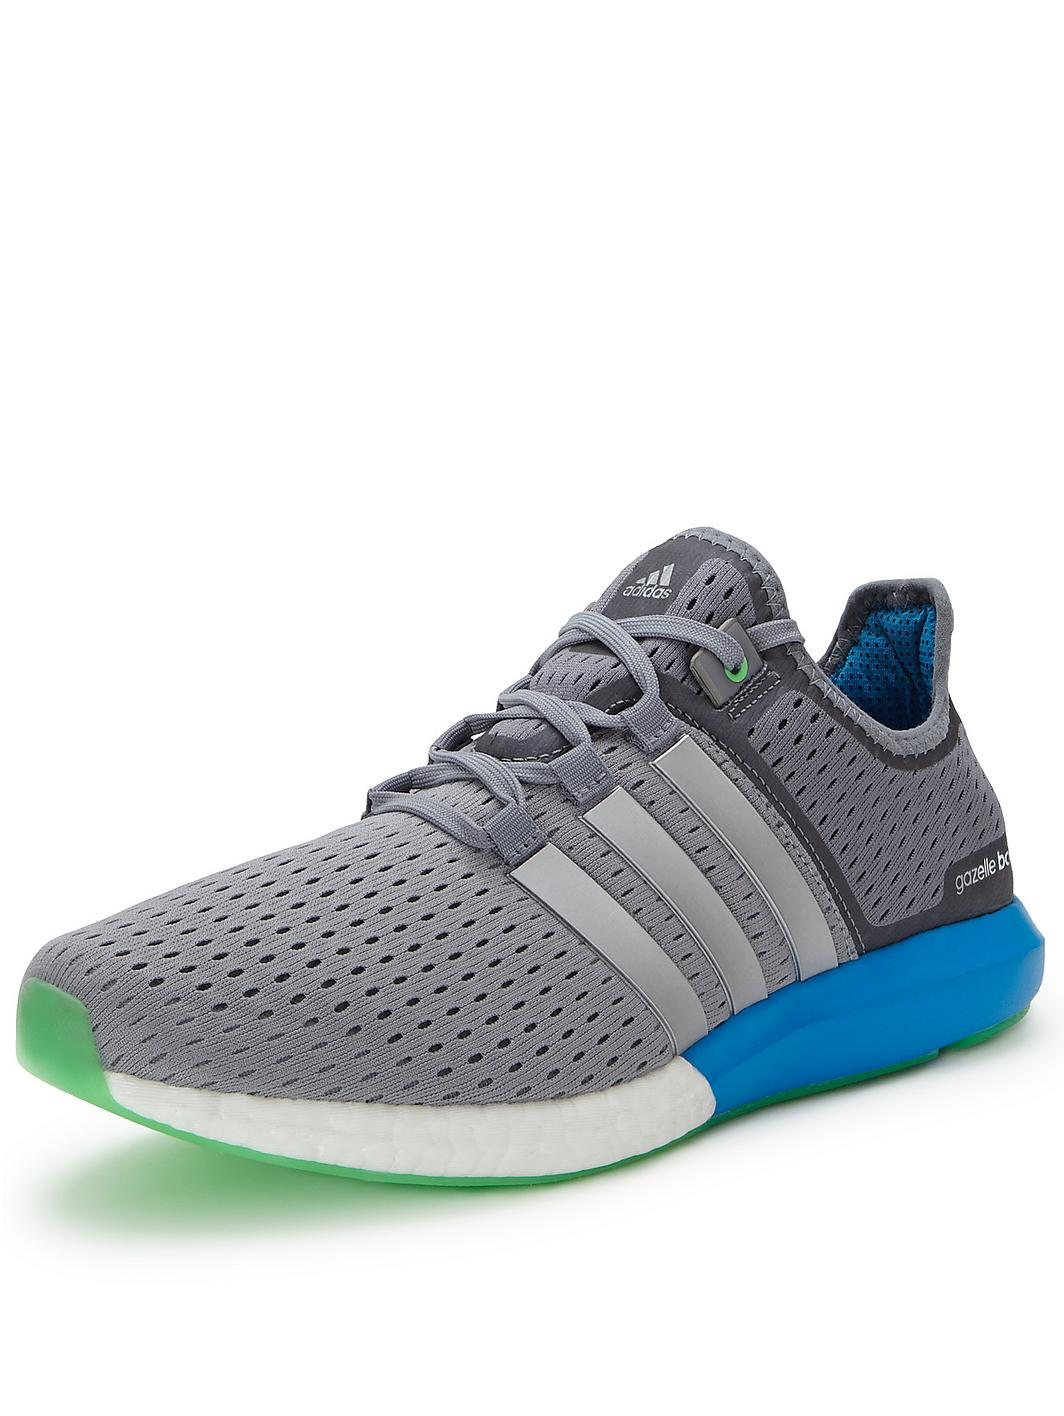 Adidas Mens Trainers Adidas-cc-gazelle-boost-g-mens